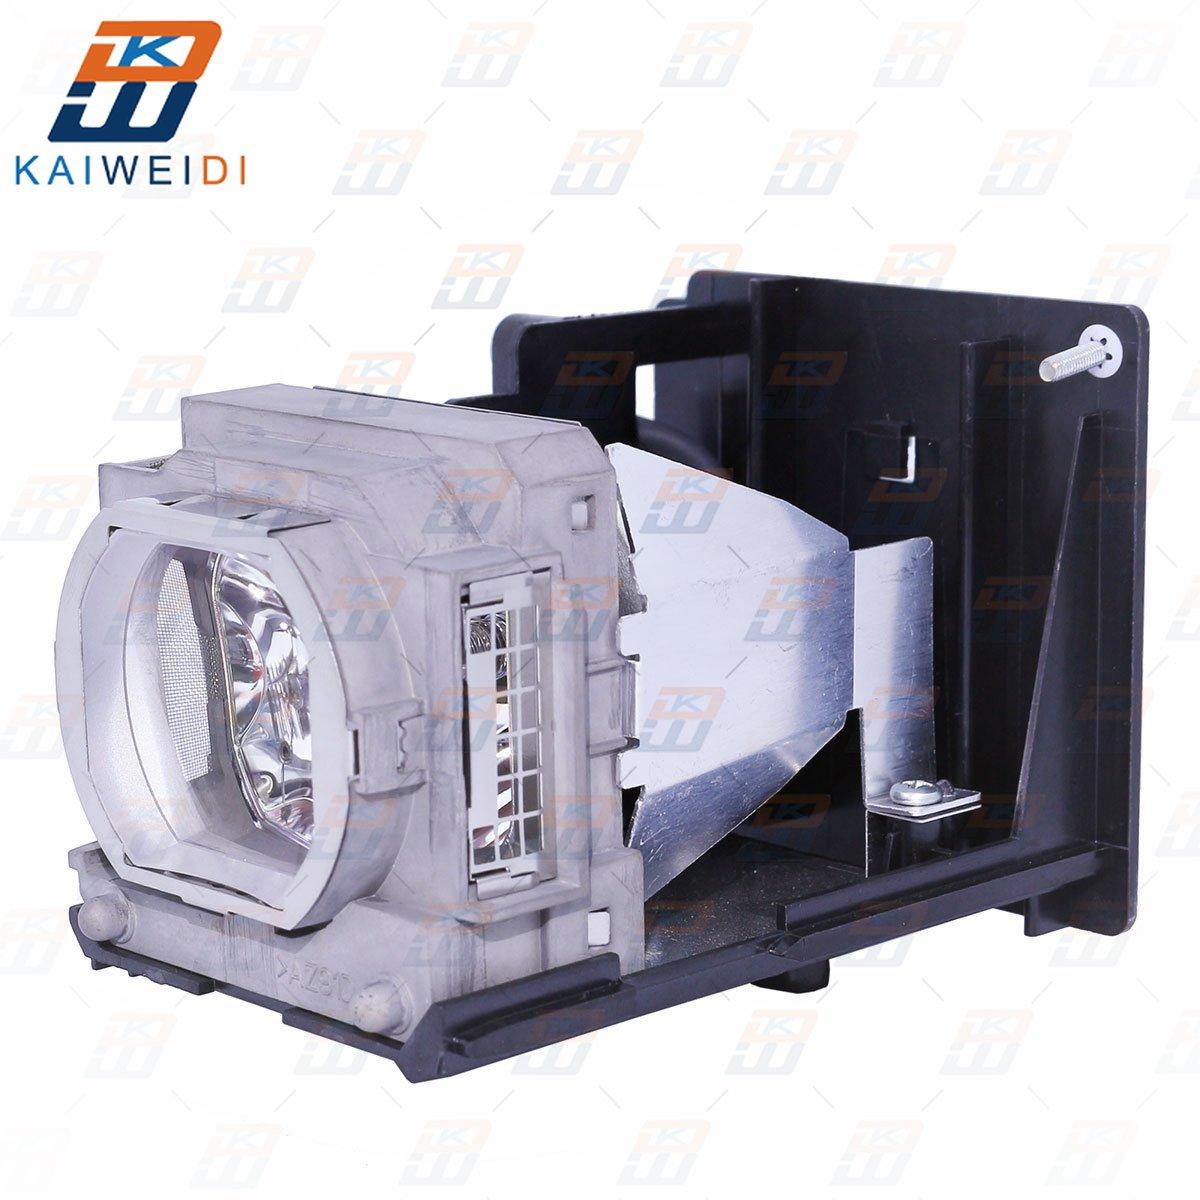 VLT-HC5000LP VLT-HC7000LP RLC-032 Mitsubishi Projector Lamp HC4900,HC5000,HC500BL,HC5500,HC6000,HC6000/BL,HC6050,HC6500,HC7000